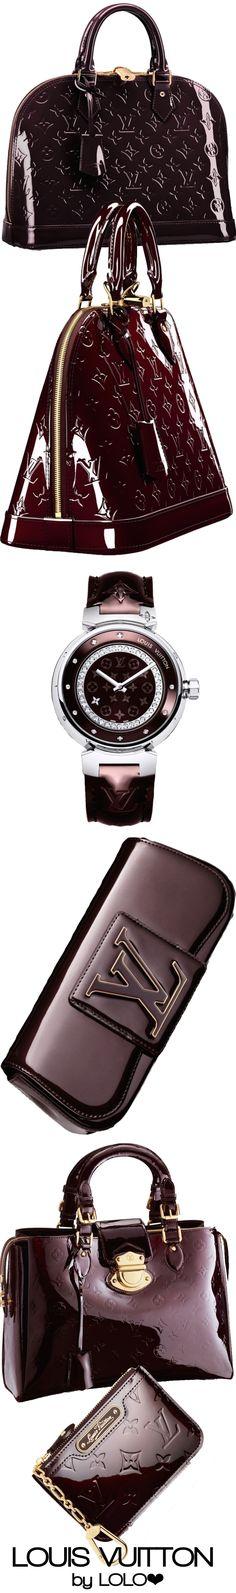 Fashion designers | Celebrity style | Louis Vuitton Handbags #Louis #Vuitton…